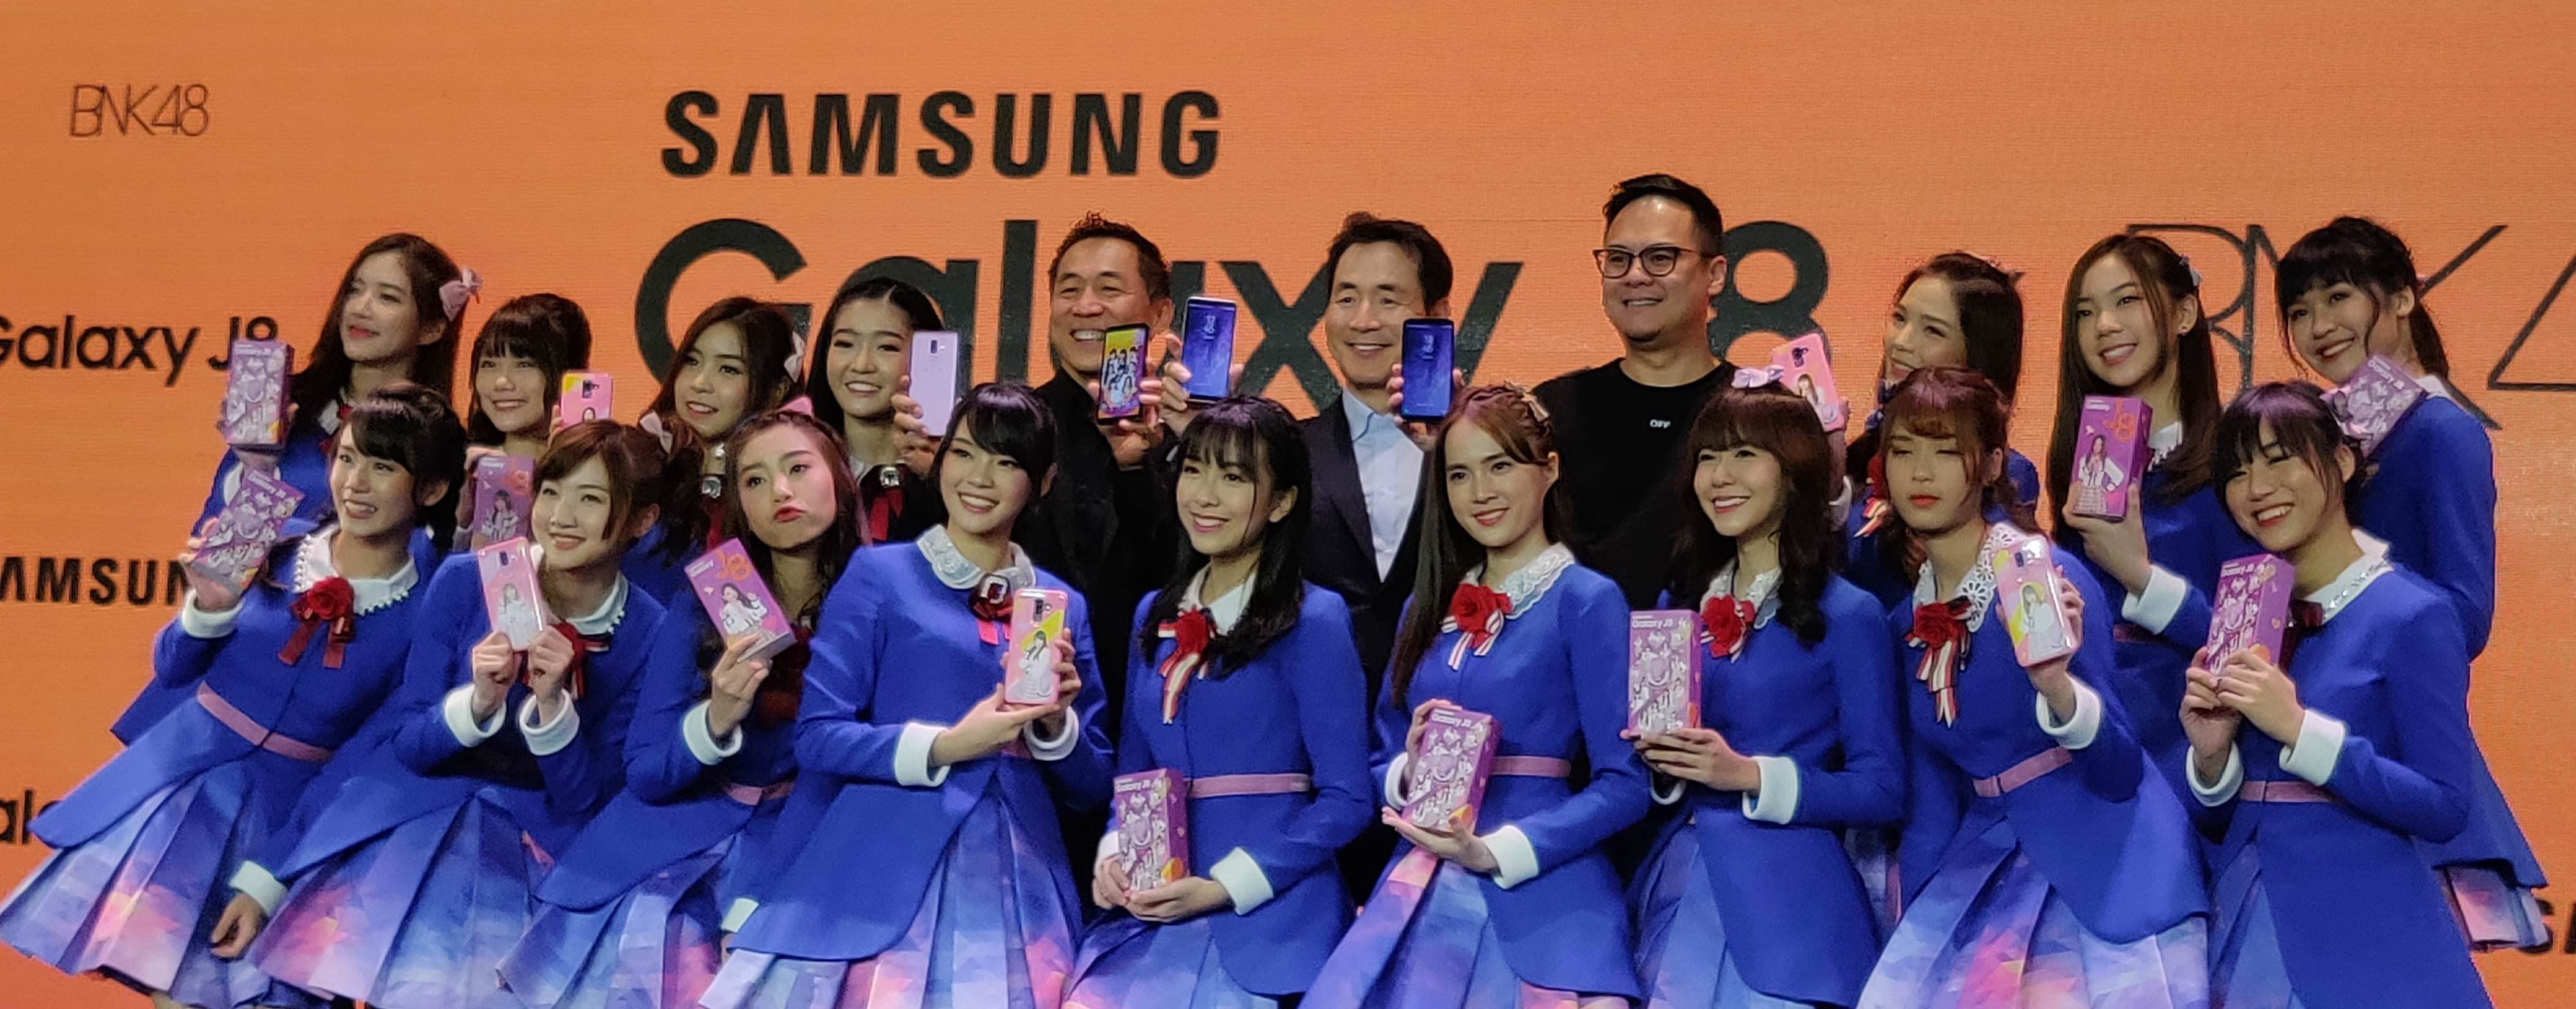 "alt=""Samsung Galaxy J8"""